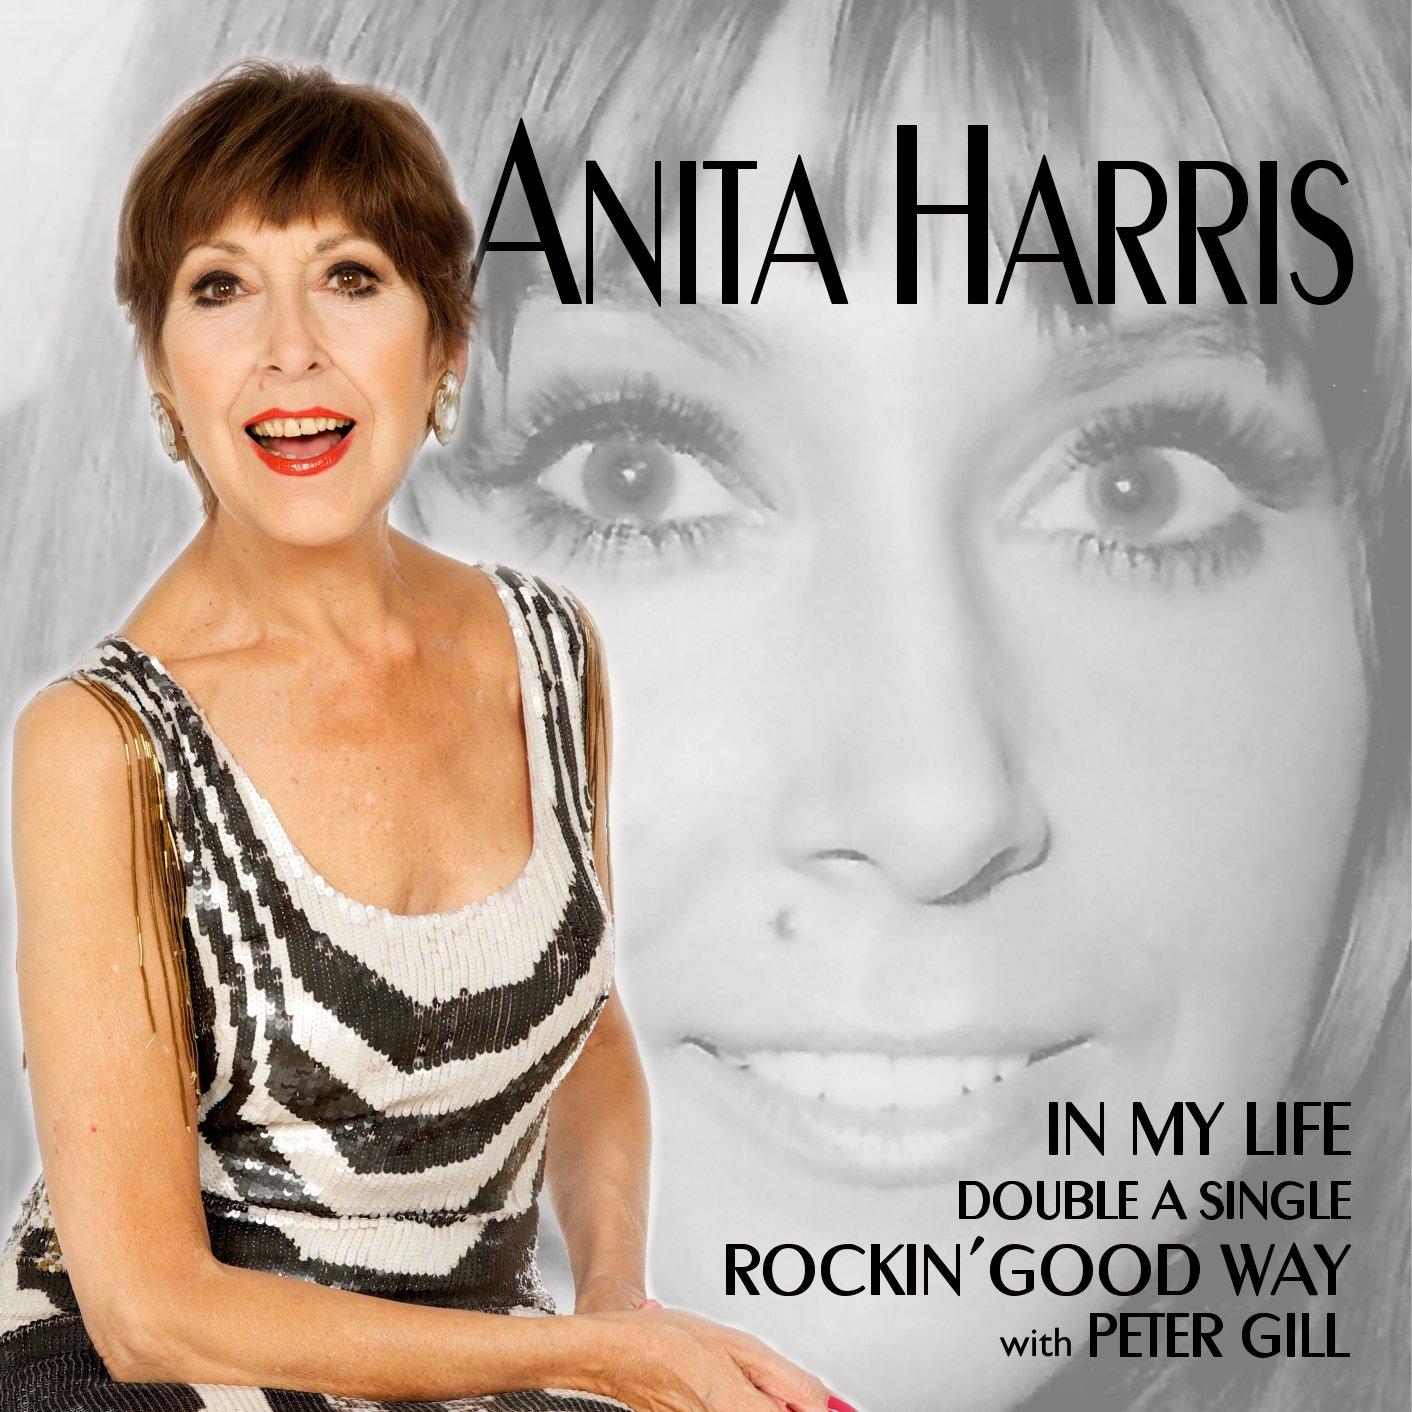 ANITA HARRIS In My Life